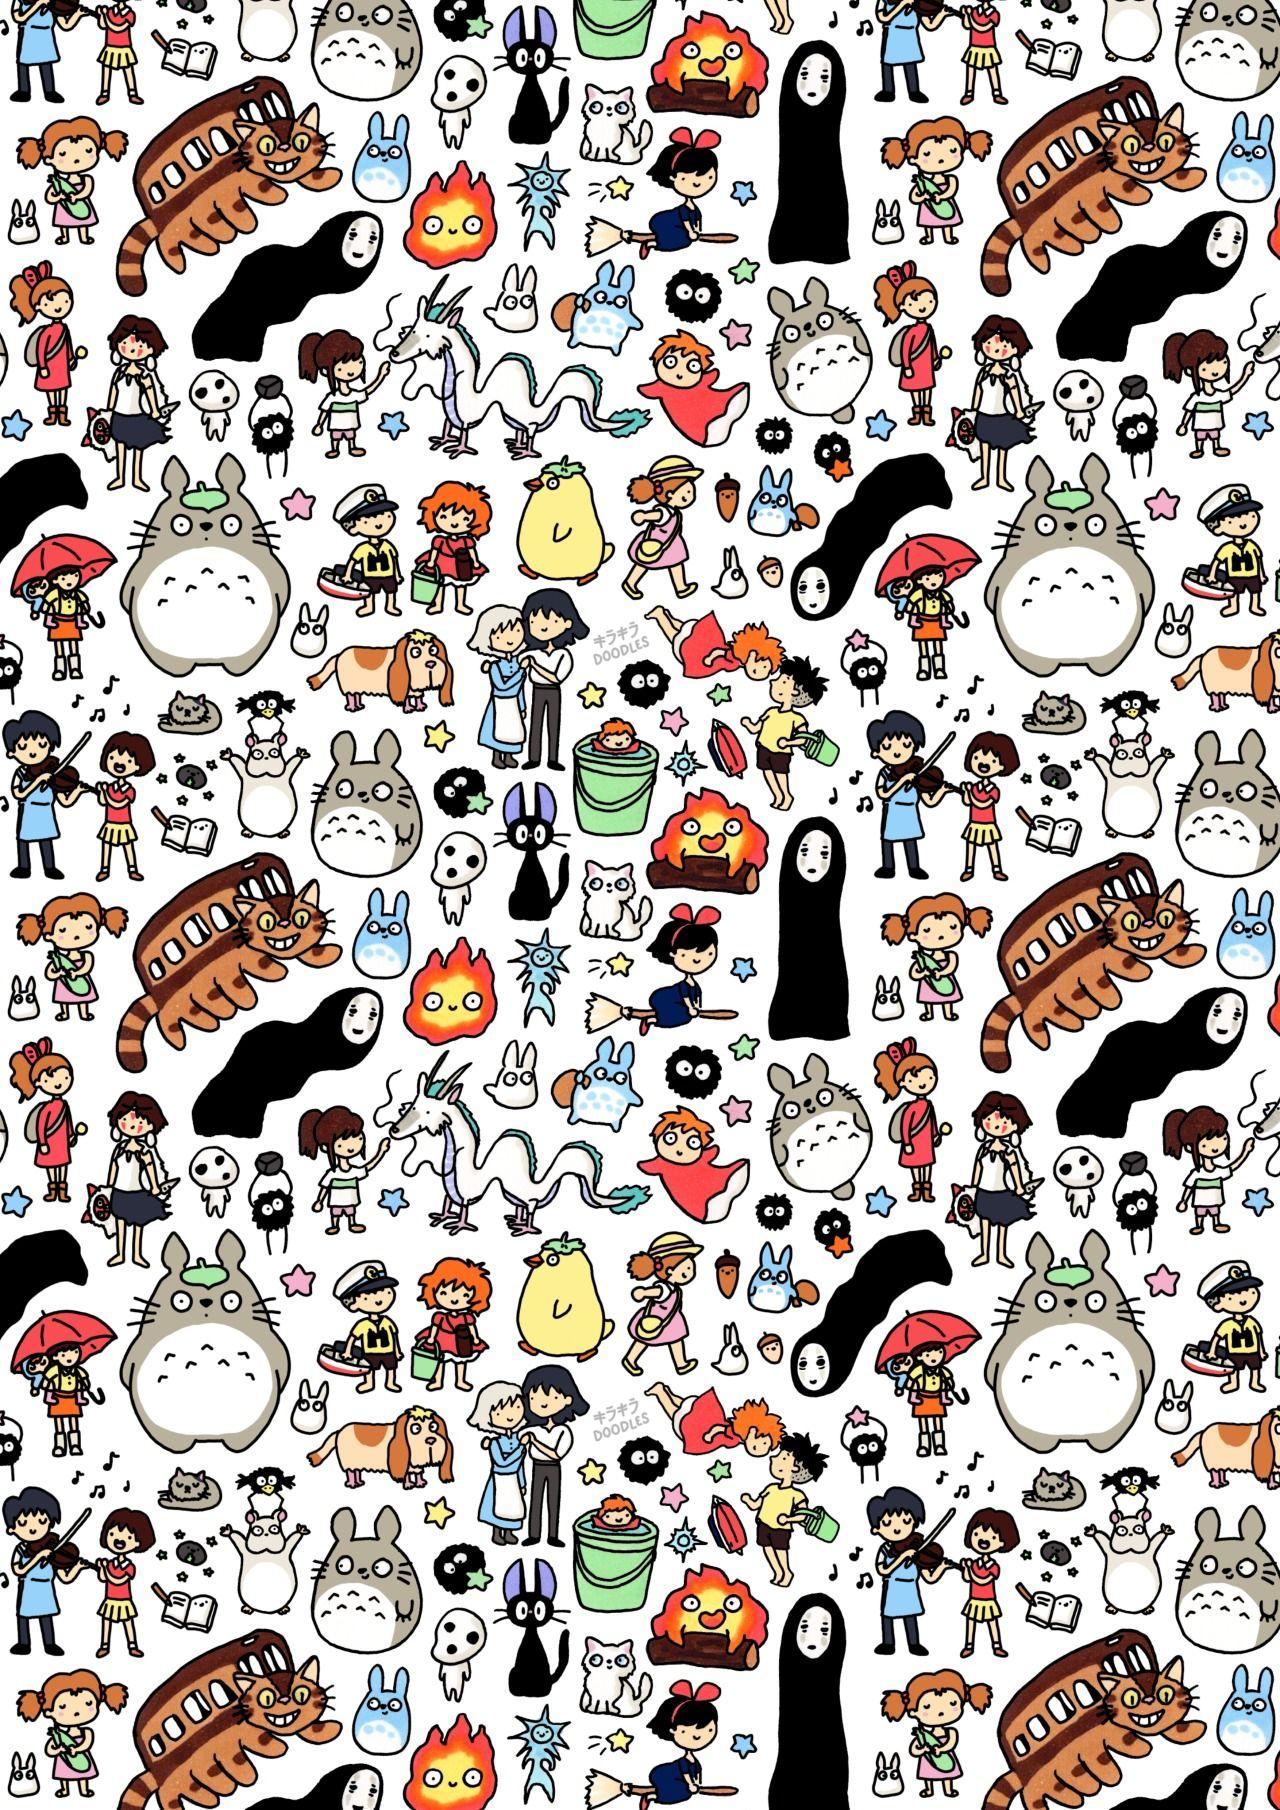 Fondos Estudios Ghibli Yayyy ノ Mi Becino Totoro La Casa Andante Spirit Pack Y Muchos Mas スタジオジブリ 鳥 イラスト かわいい 宮崎駿